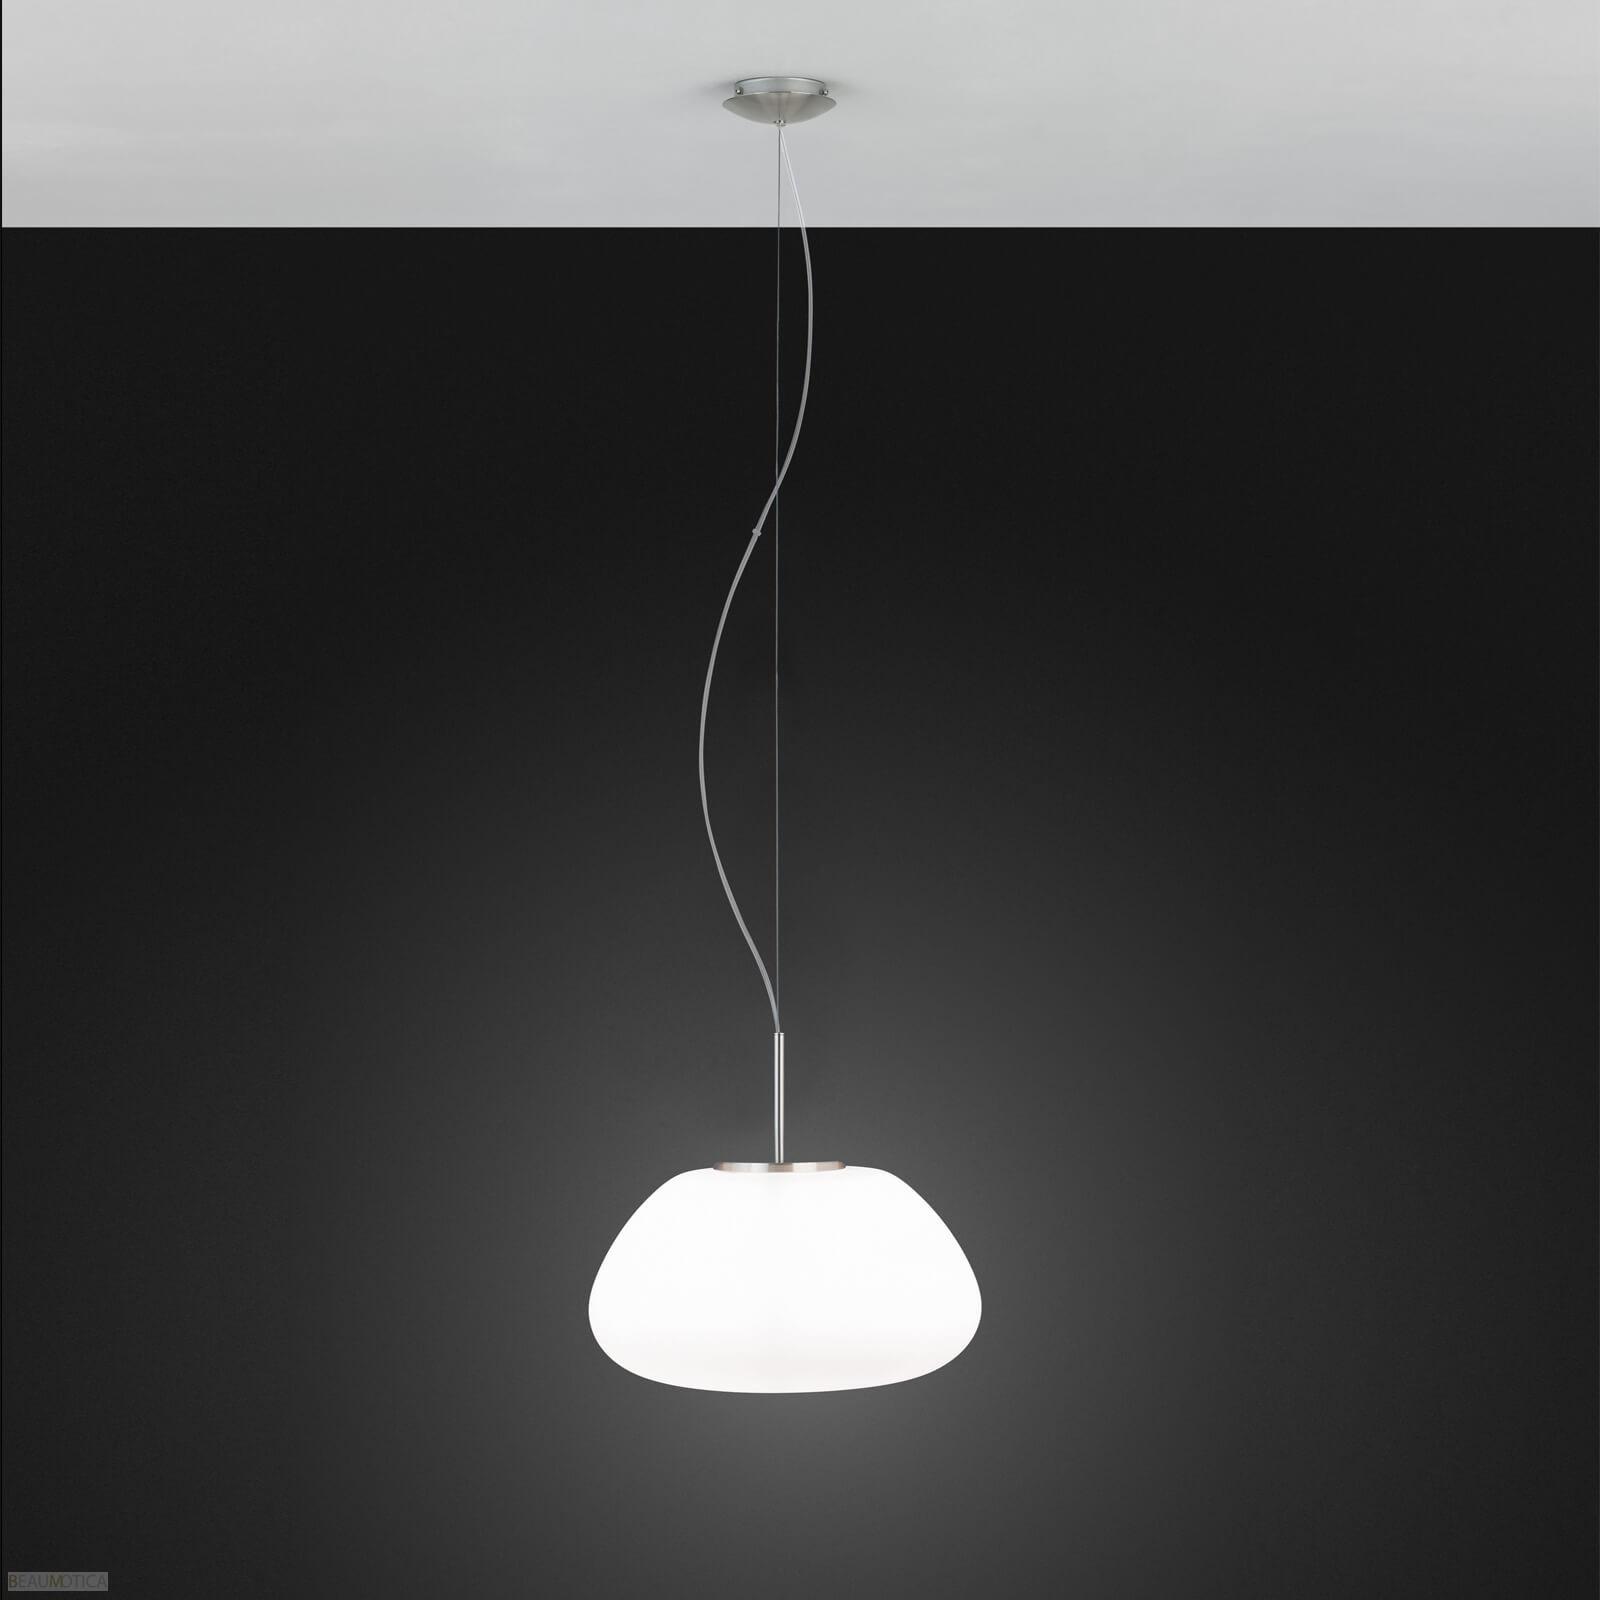 Afbeelding van Eglo Balmes Hanglamp Mat Chroom, Opaal (ø41,5cm)